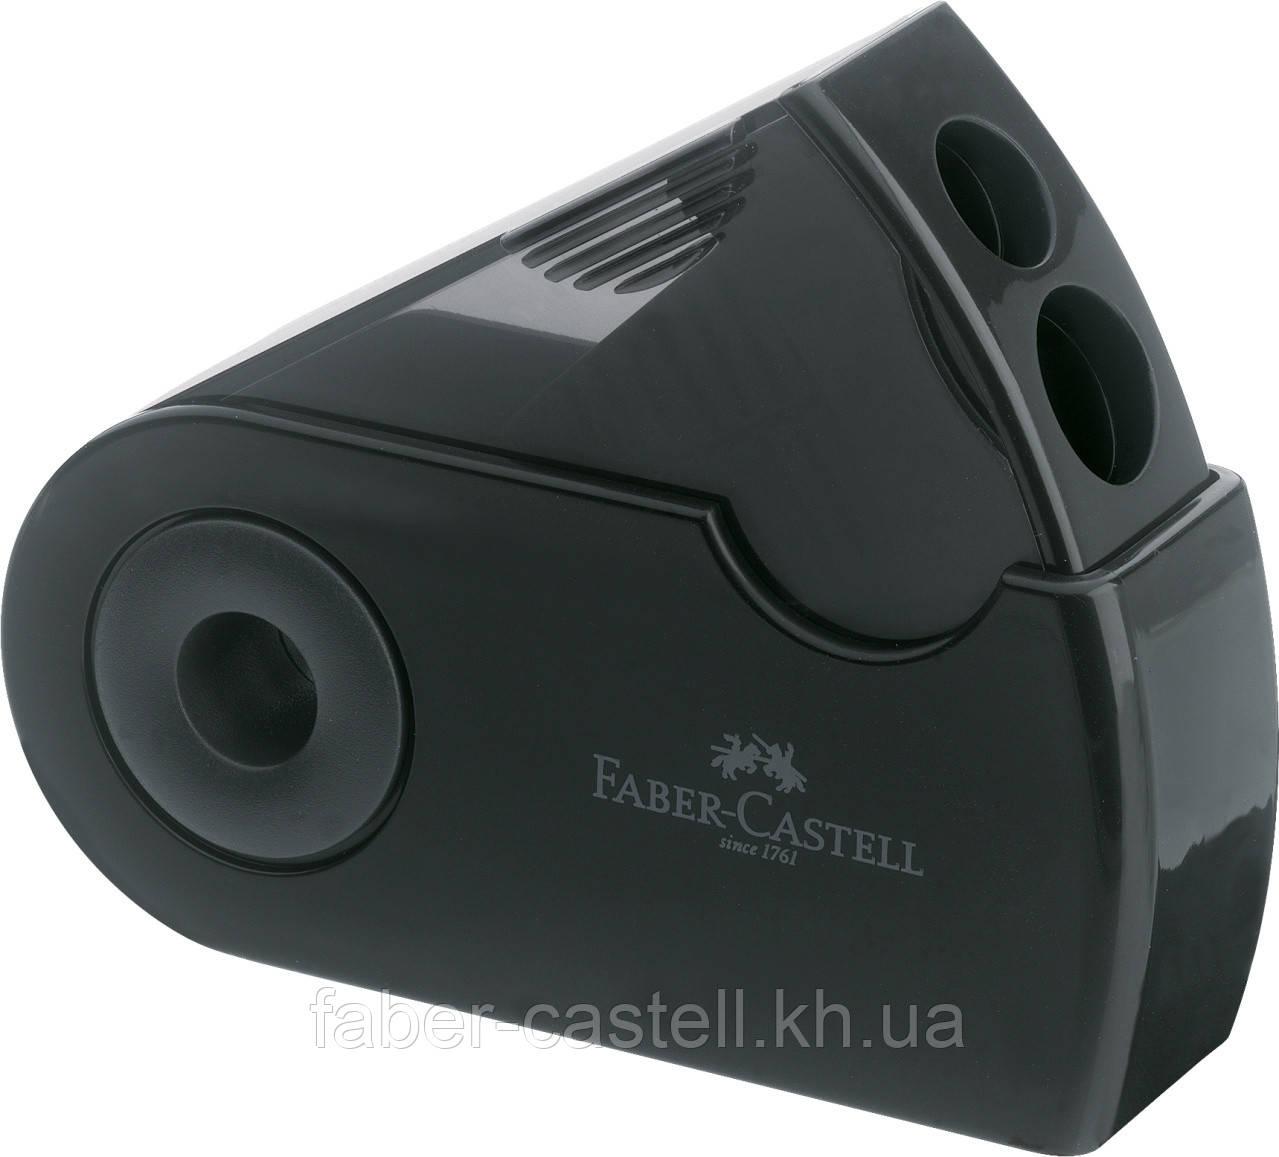 Двойная точилка Faber-Castell Sleeve  с контейнером черная, 182700